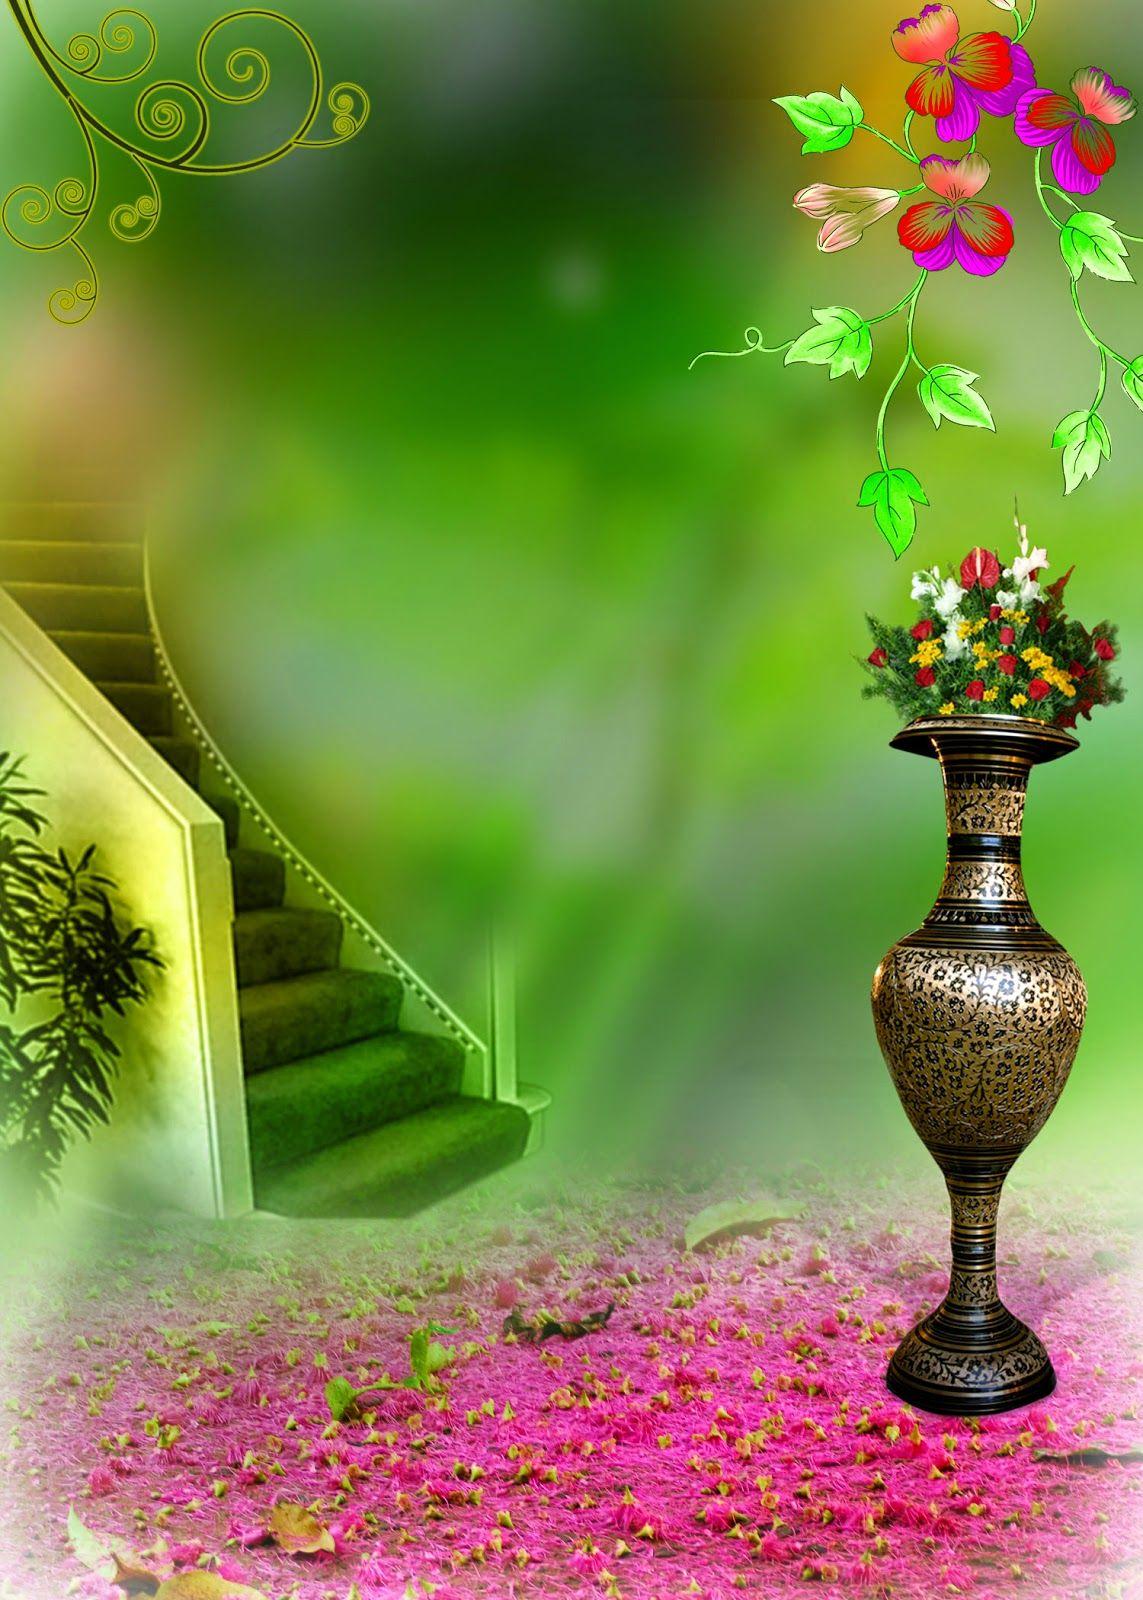 studio background psd files also hd free download adobe photoshop rh pinterest